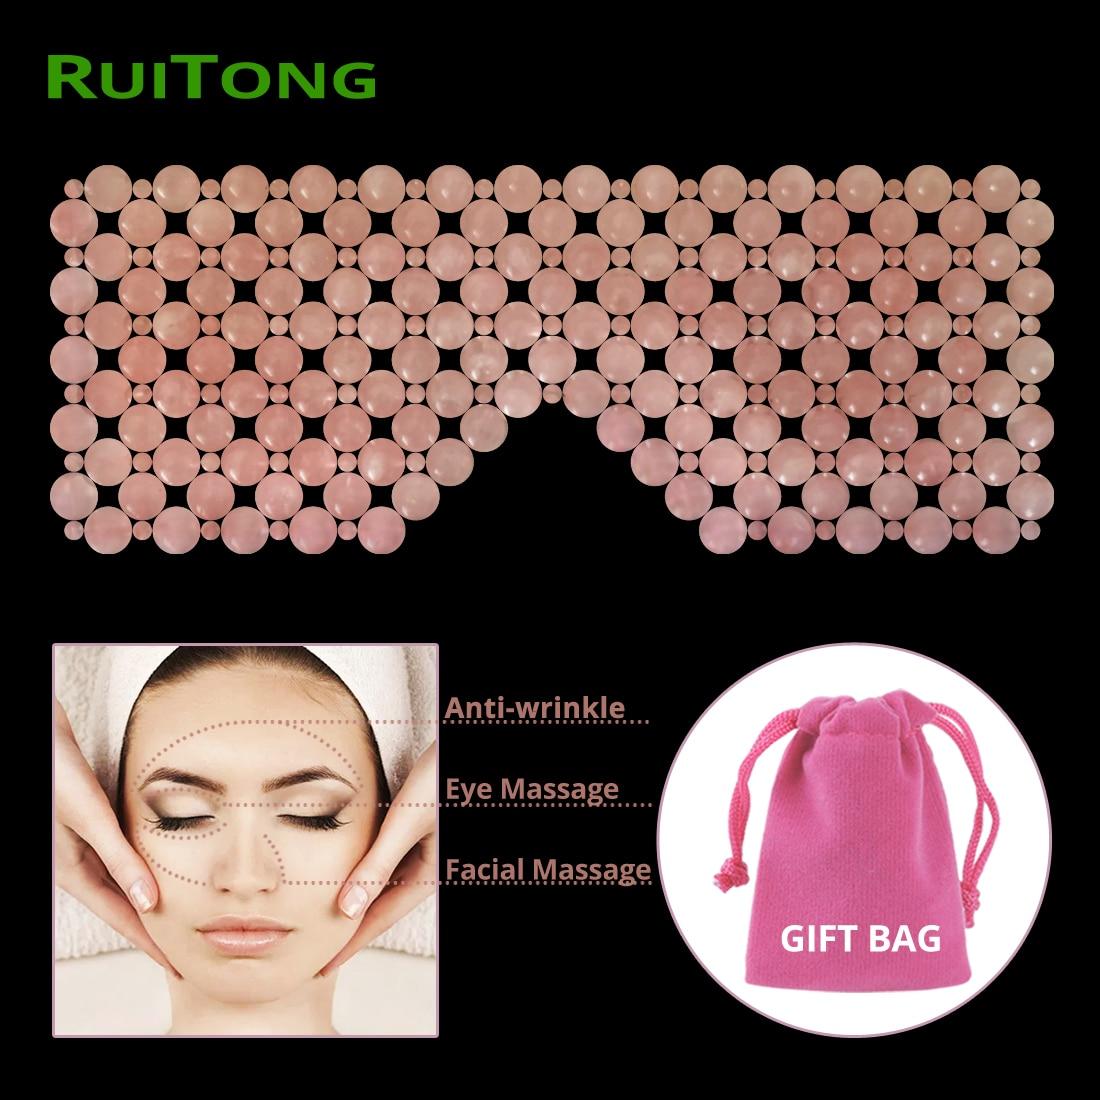 Drop Shipping Eye Massager Rose Quartz Facial Massage Mask Natural Jade Anti-wrinkle Face Massager Massage & Relaxation RuiTong